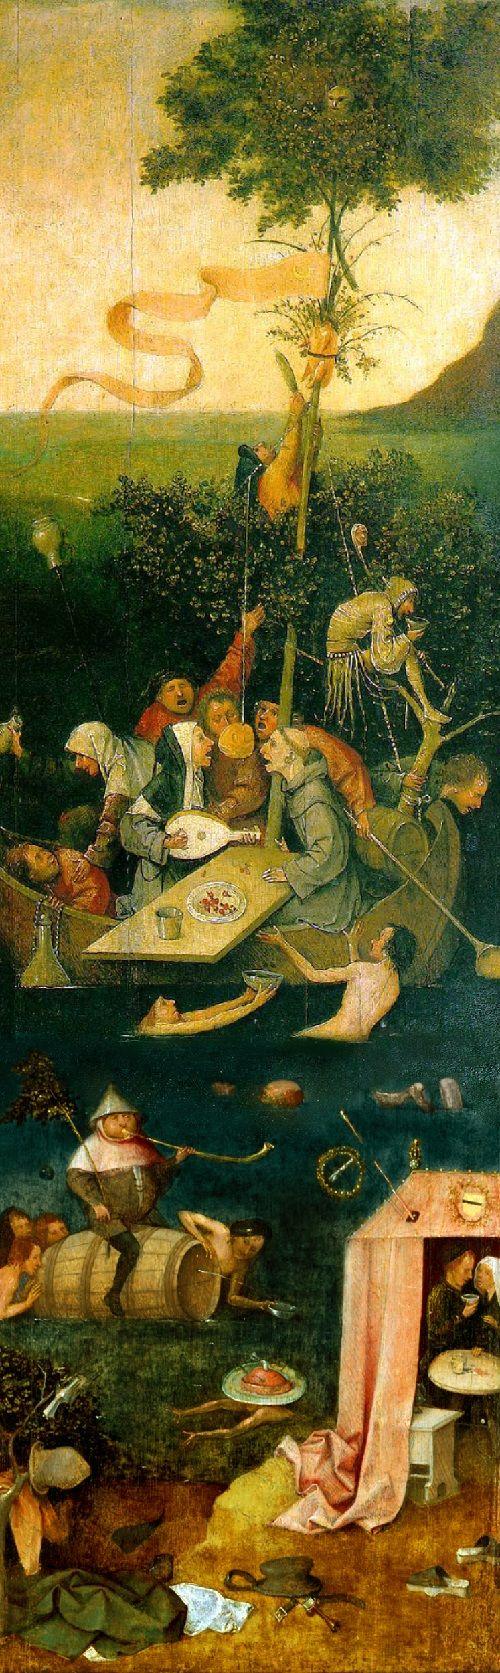 La Nef Des Fous (bosch) : (bosch), Hieronymus, Bosch